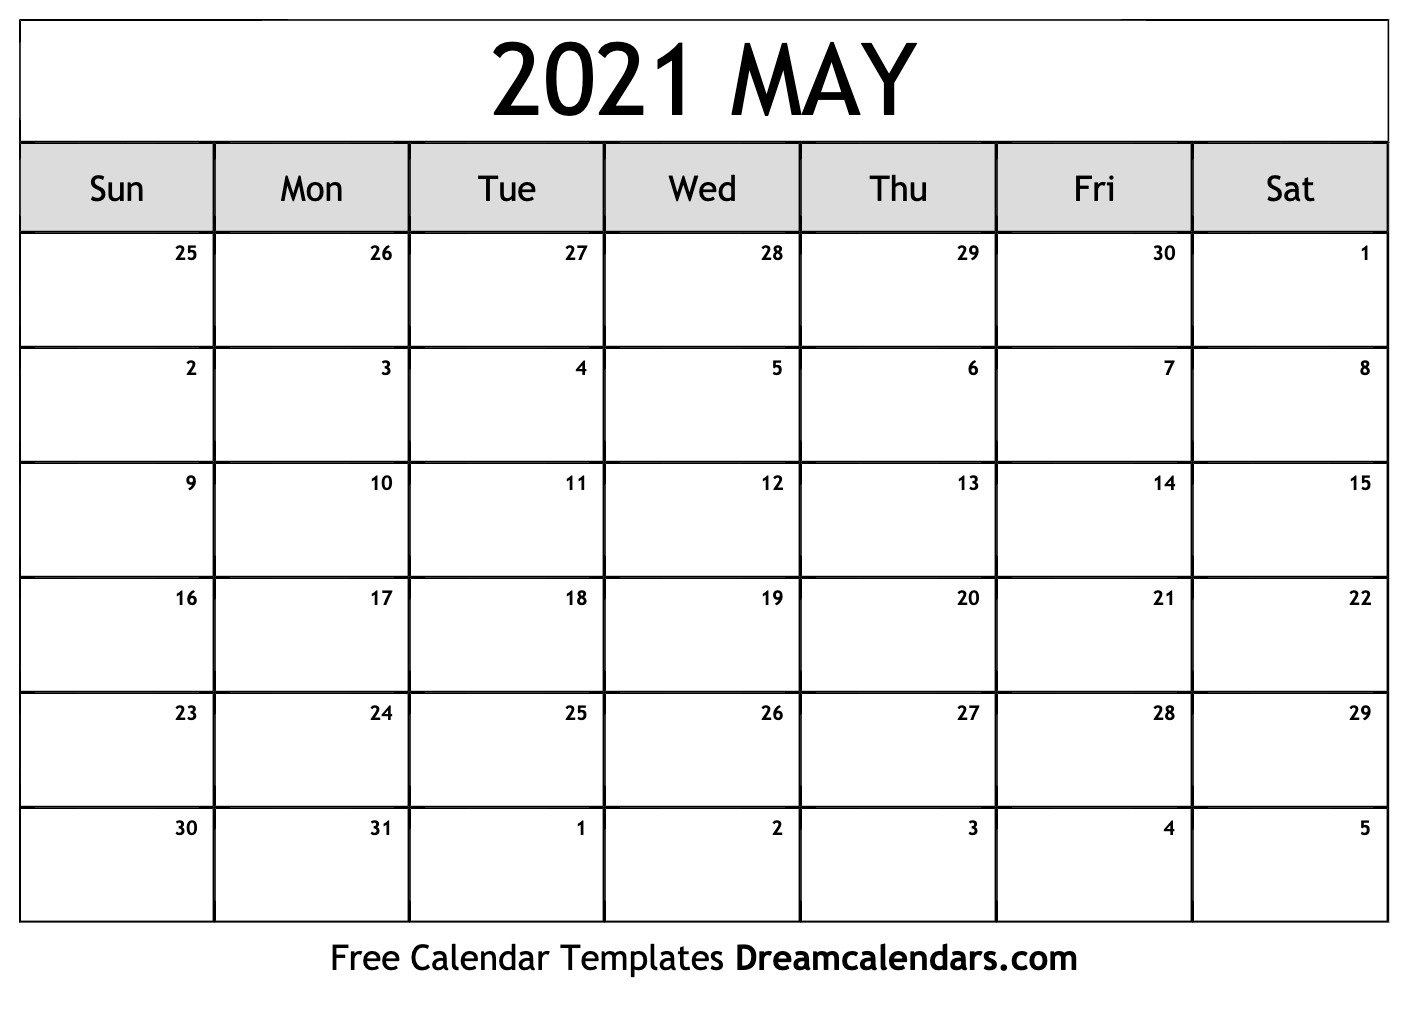 May 2021 Calendar | Free Blank Printable Templates